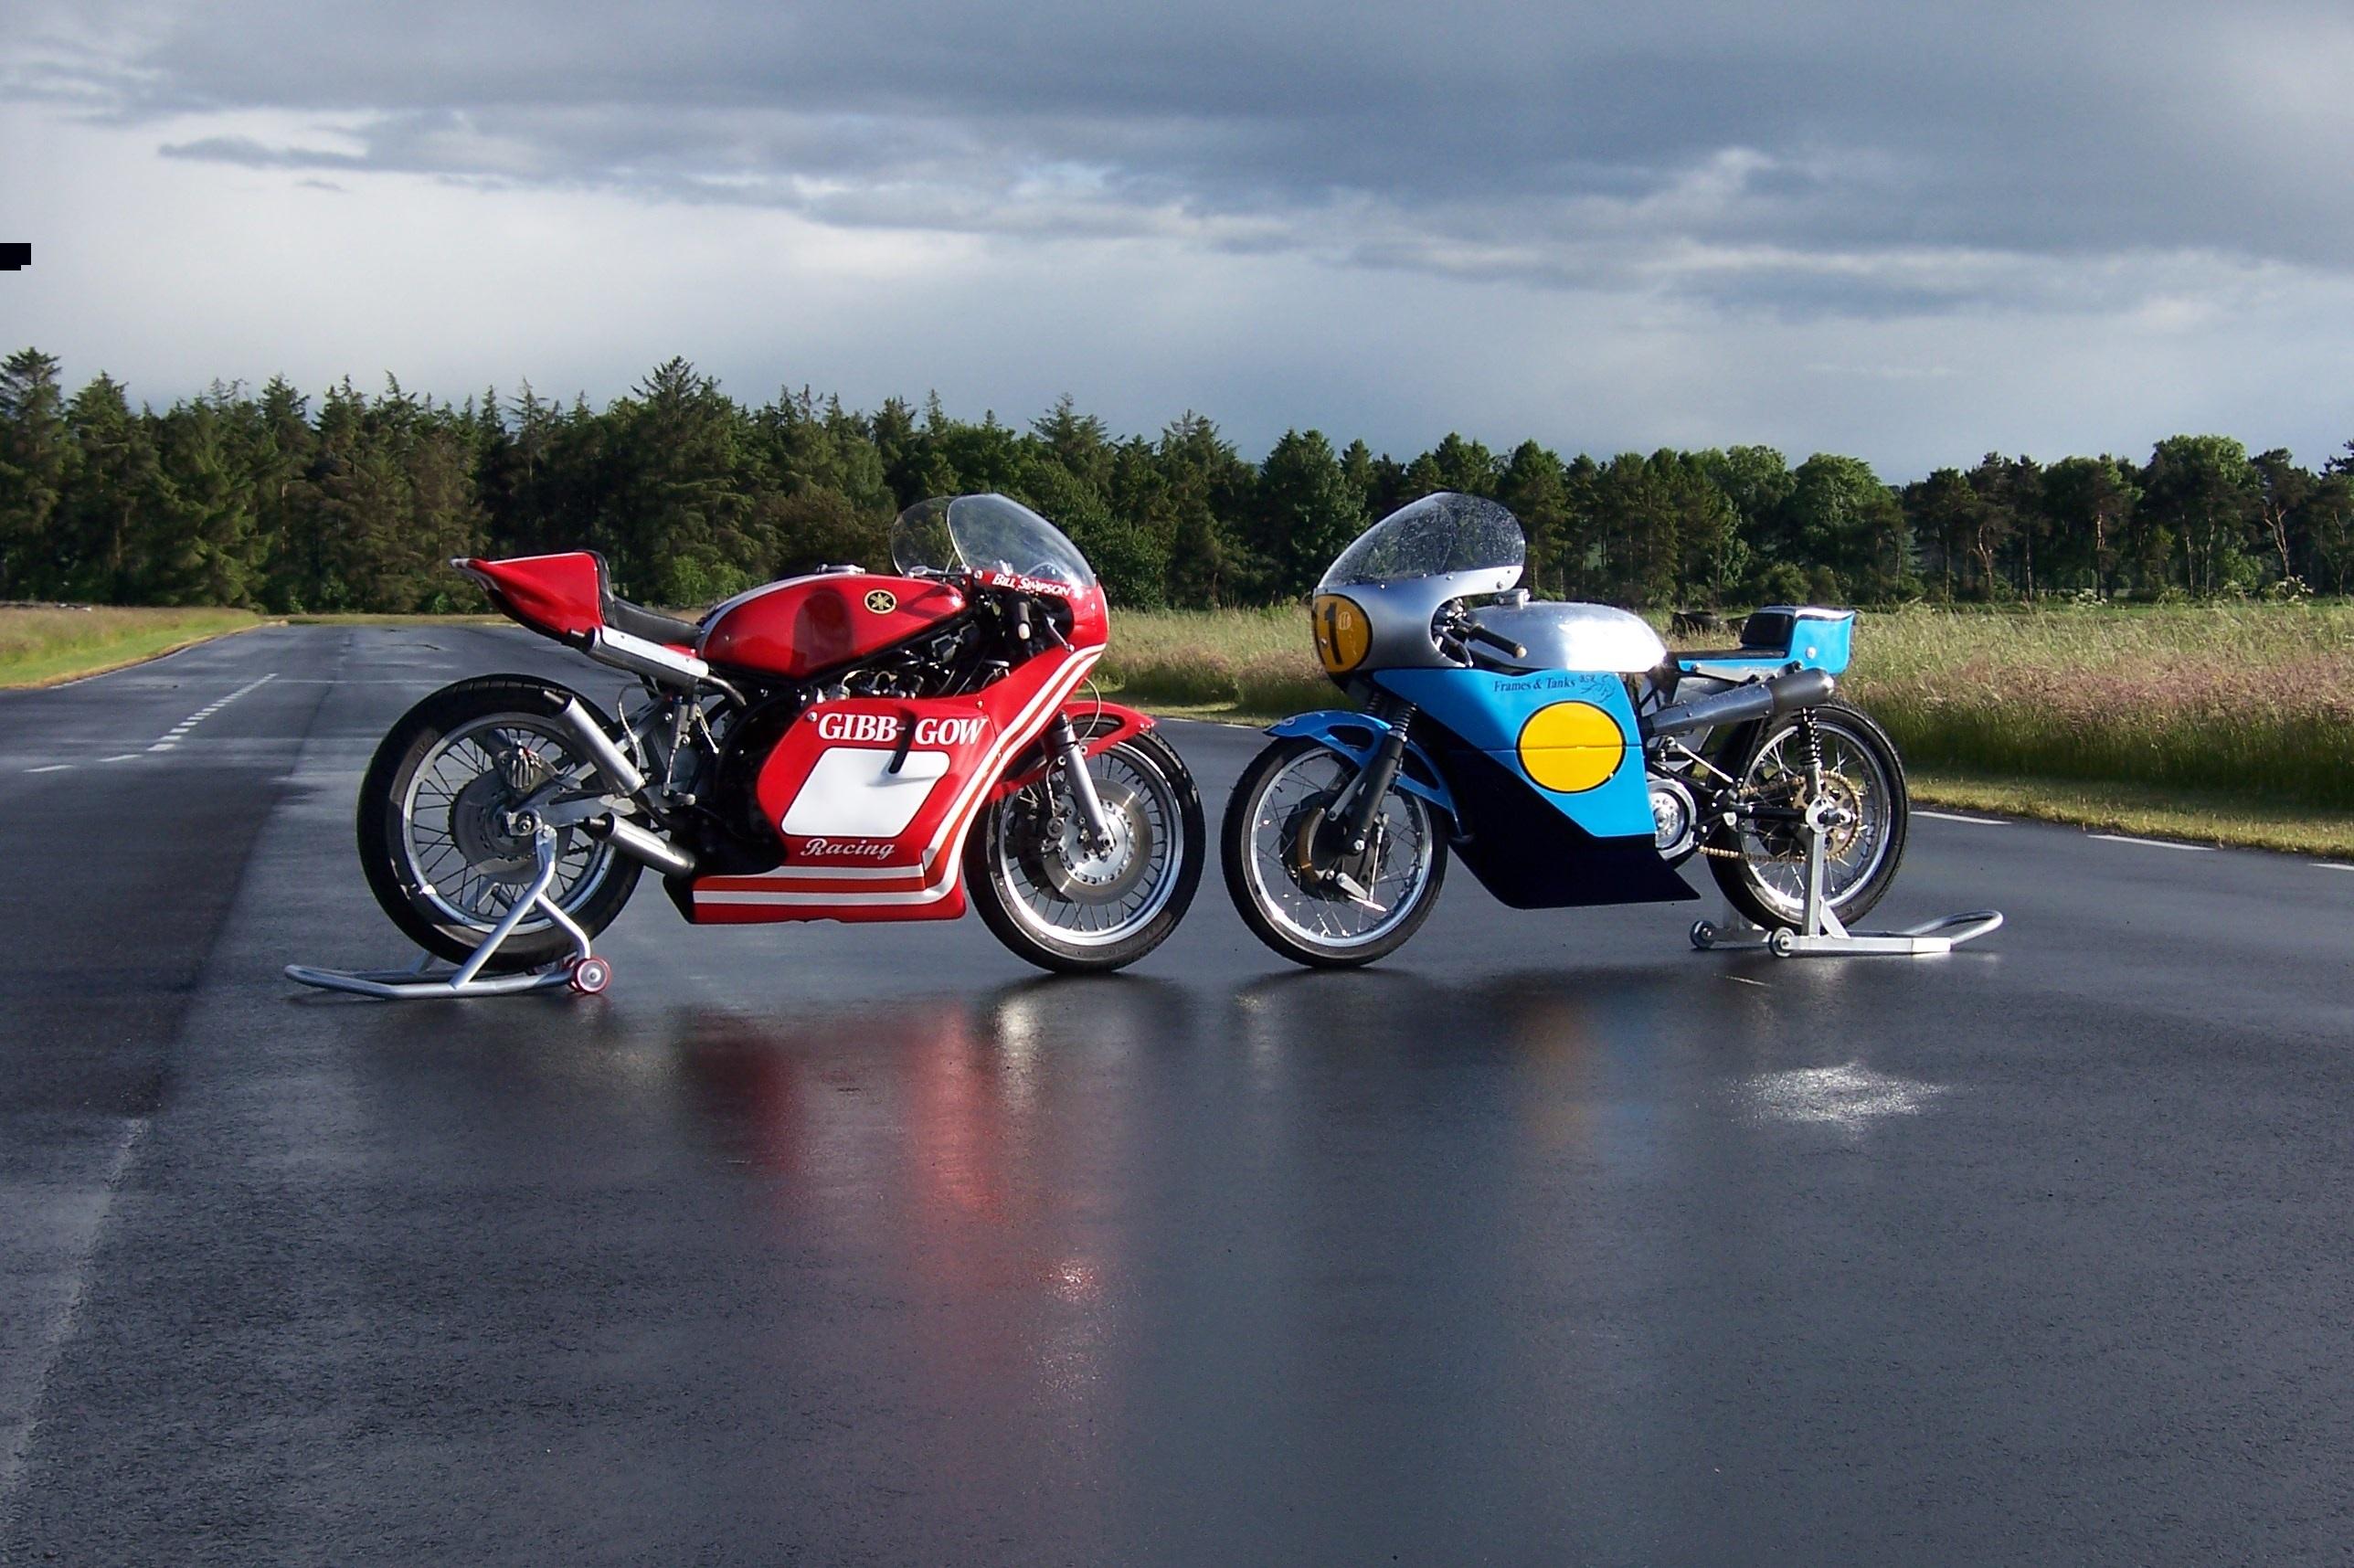 TZ750 Yamaha and Seeley G50 Matchless